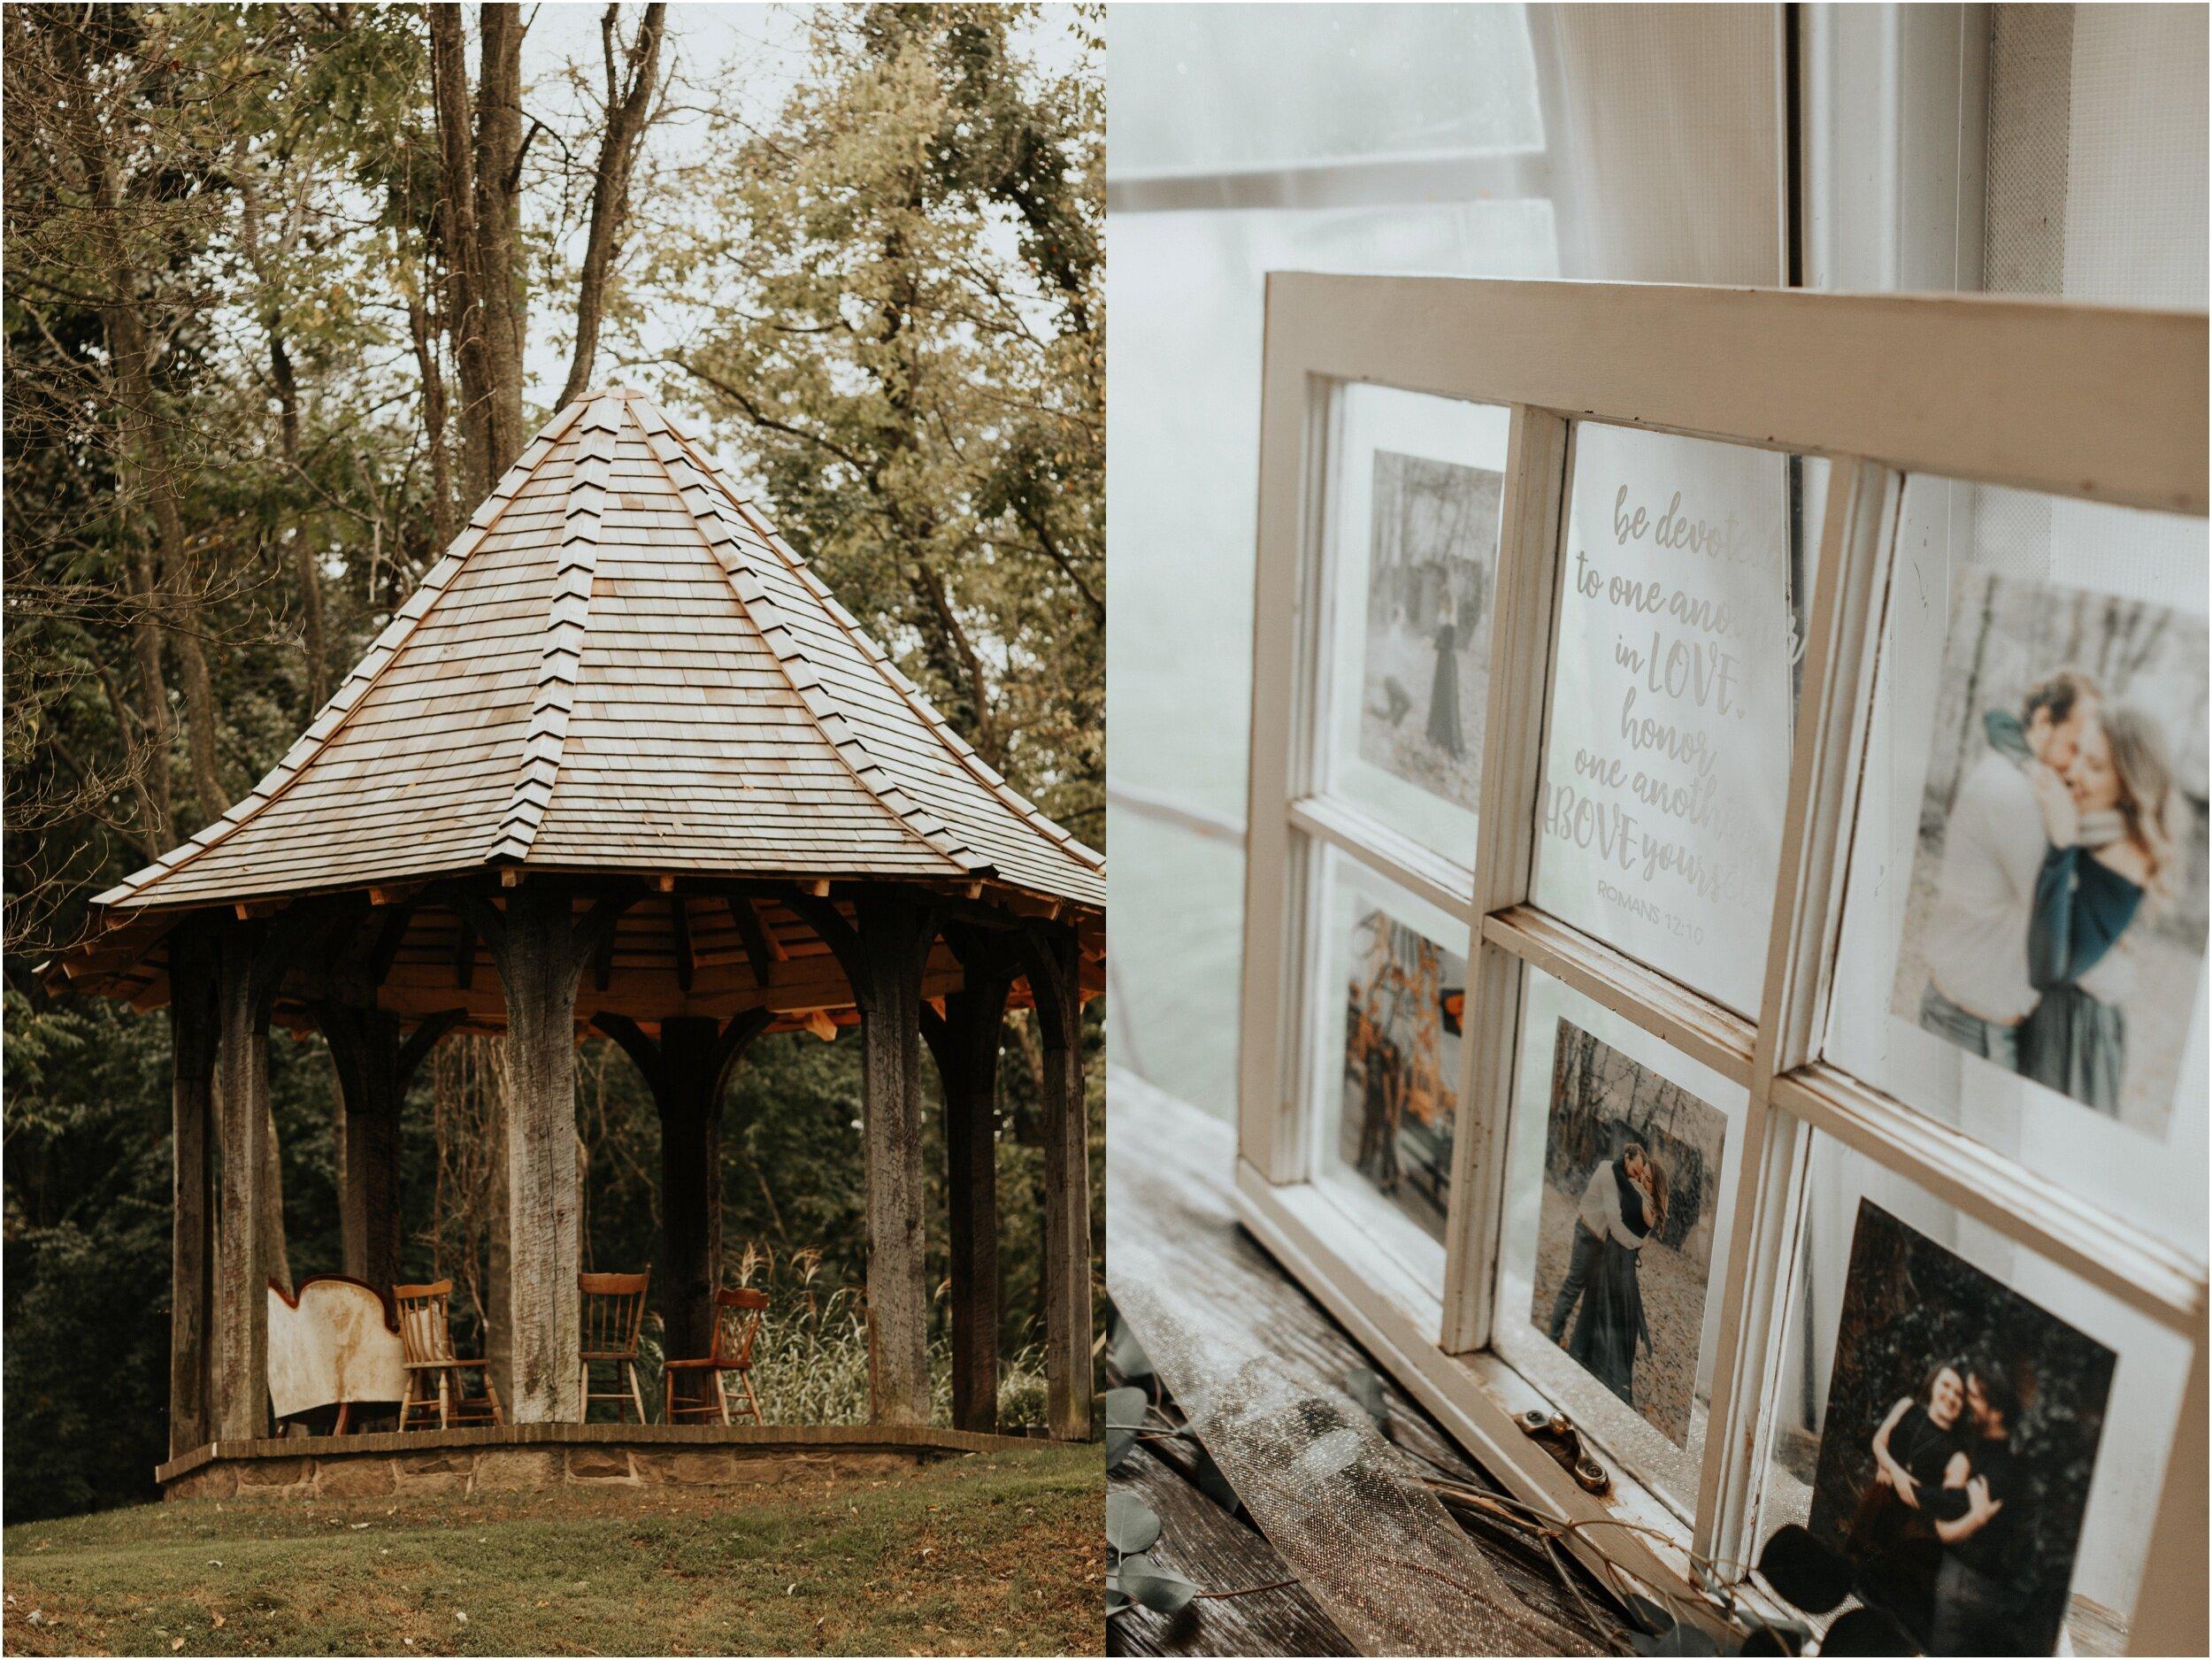 steph-and-jordan-cox-our-wedding-historic-shady-lane-compass-wedding-collective-hazel-lining-photography-destination-elopement-wedding-engagement-photography_0076.jpg